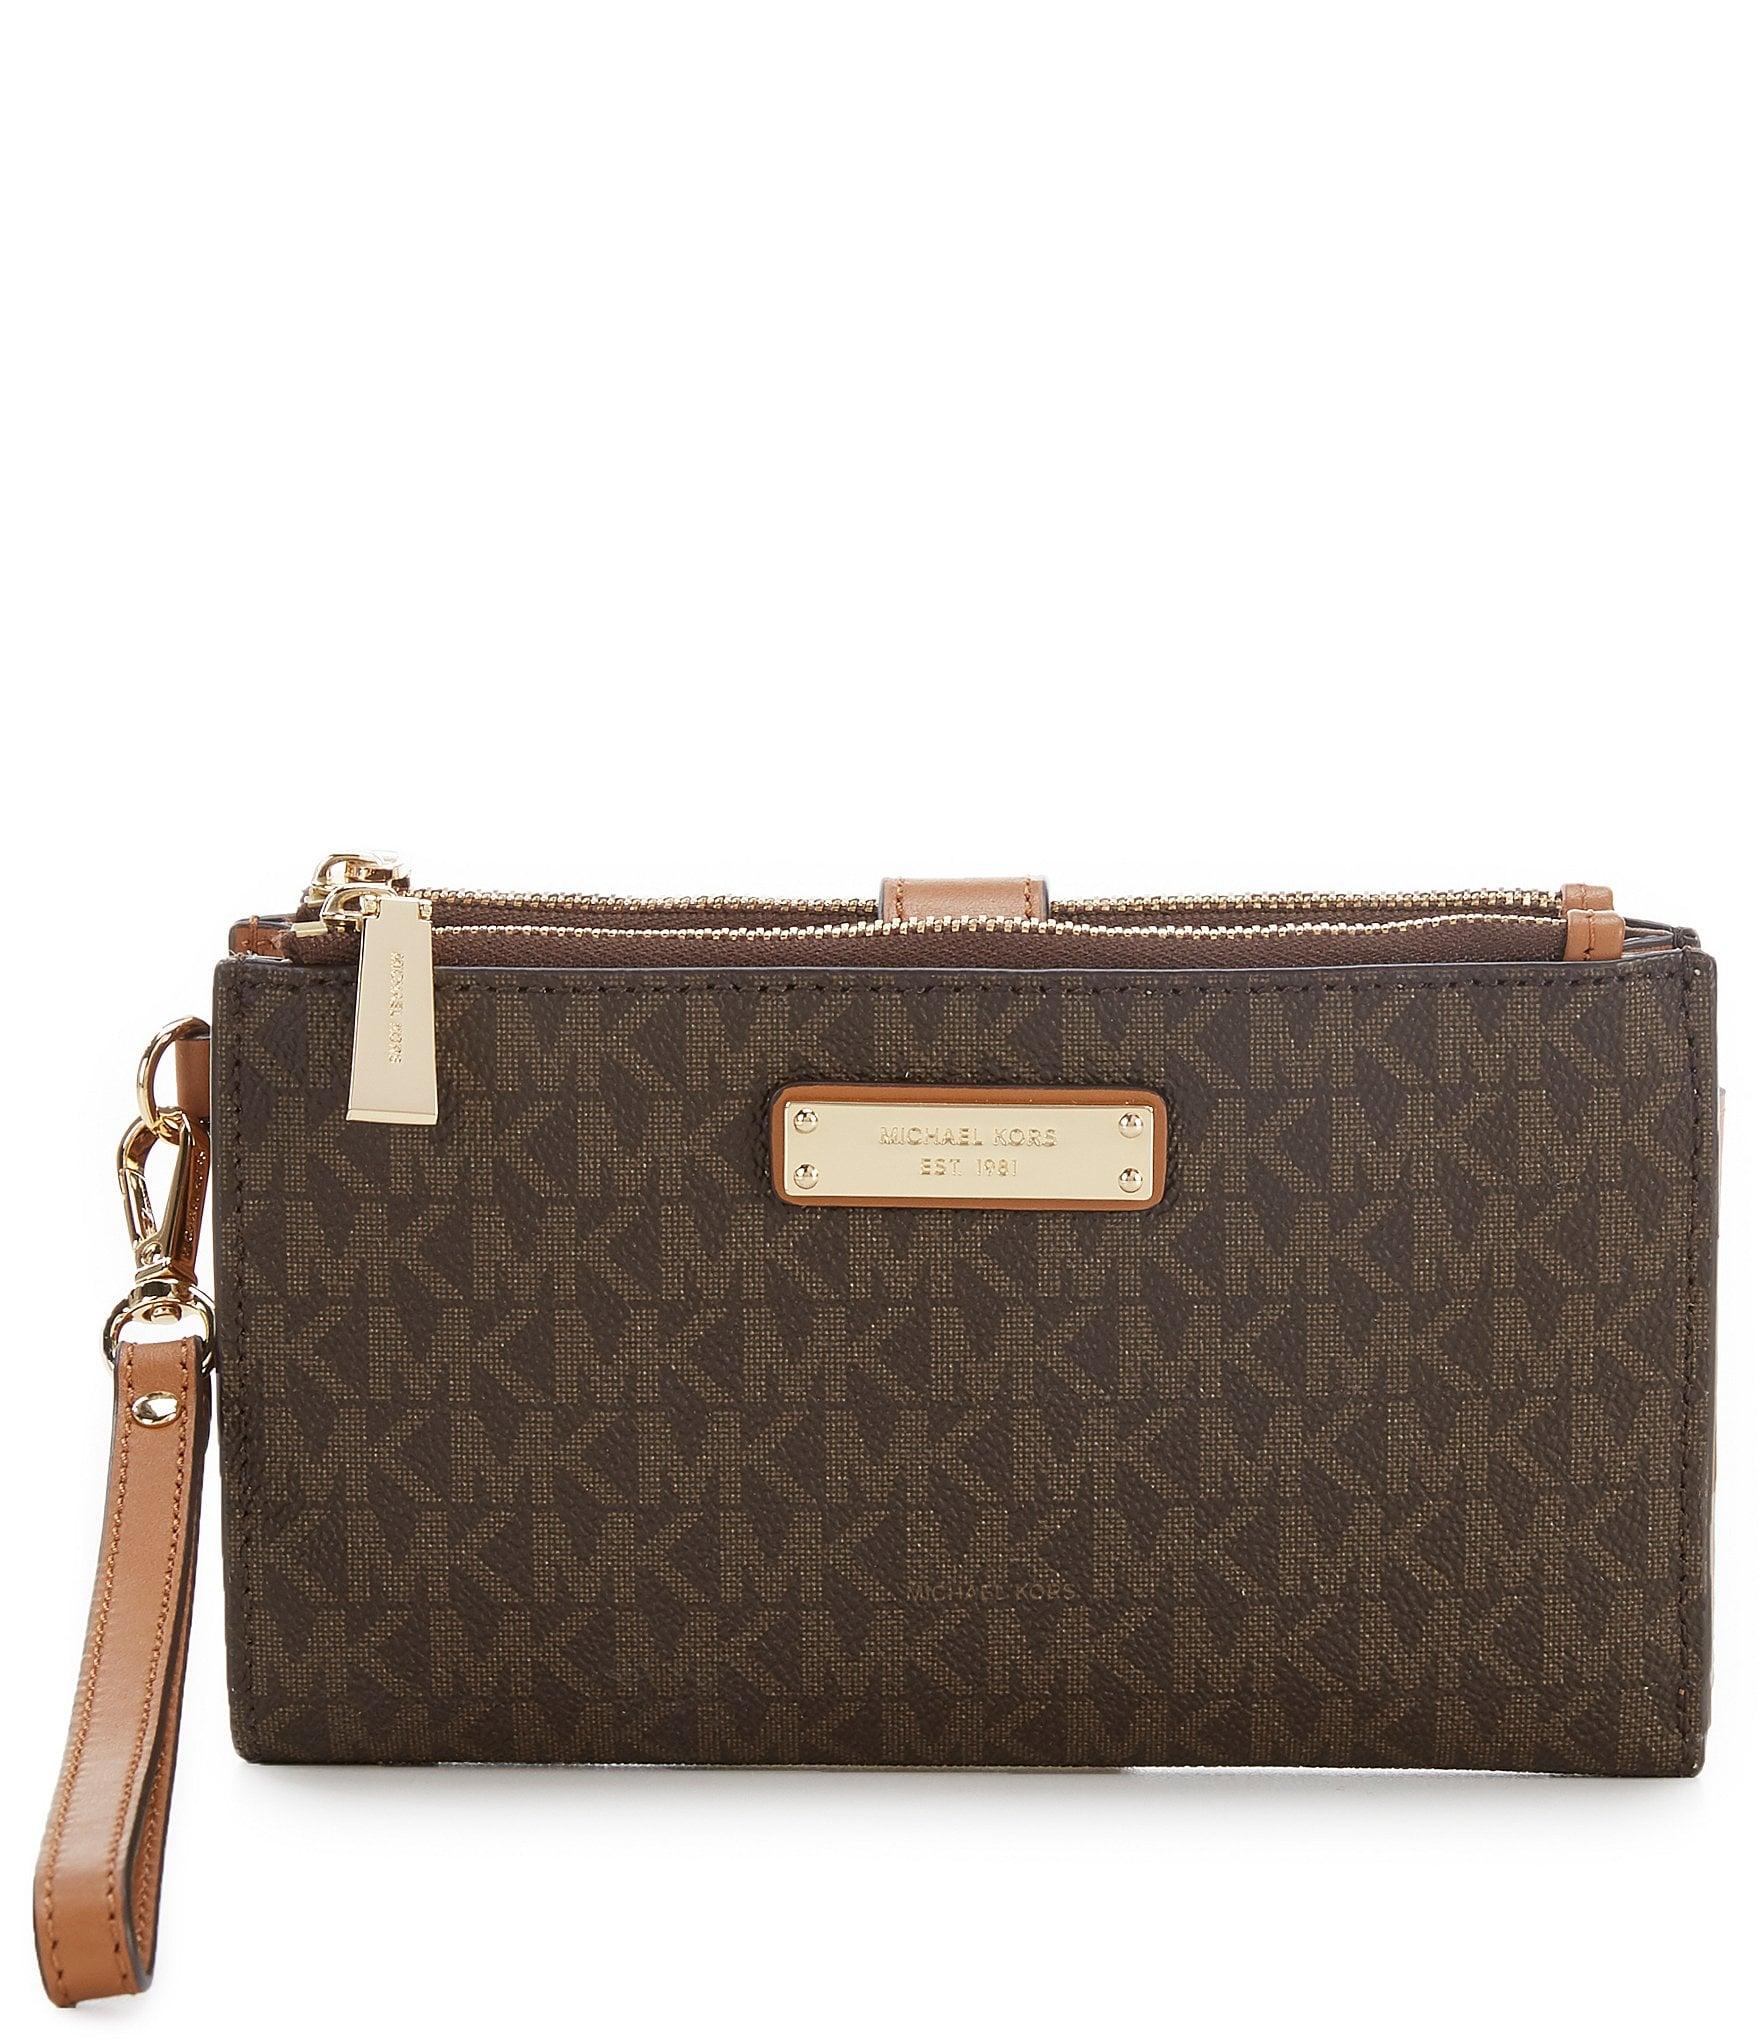 9a36ec3286d8 MICHAEL Michael Kors Handbags | Wristlets, Keychains, & Cases | Wristlets |  Dillard's